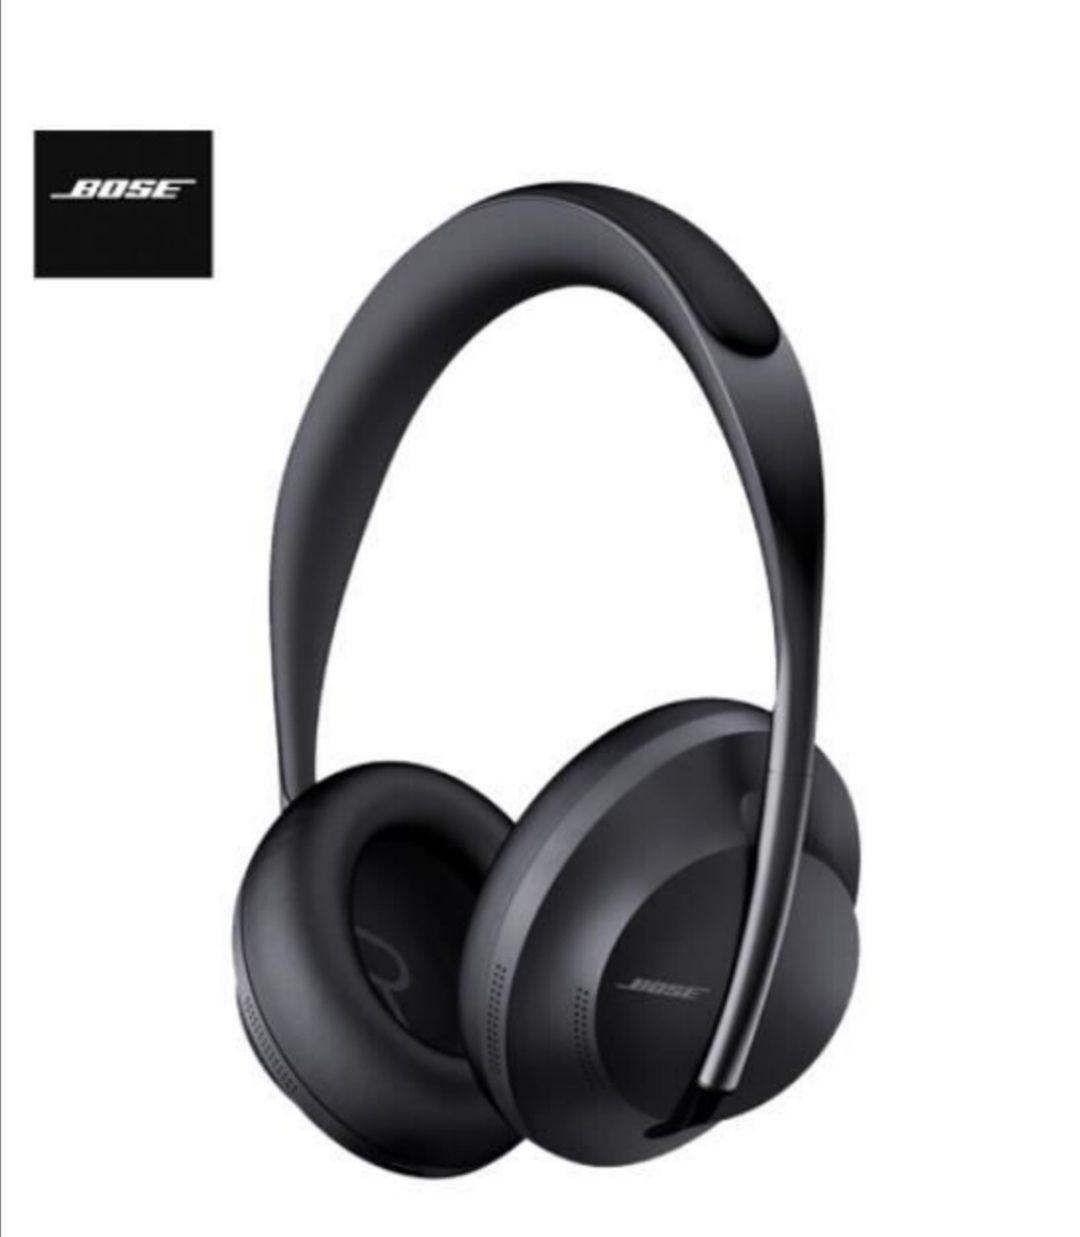 Casque audio Bose HeadPhone 700 (Vendeur Tiers)